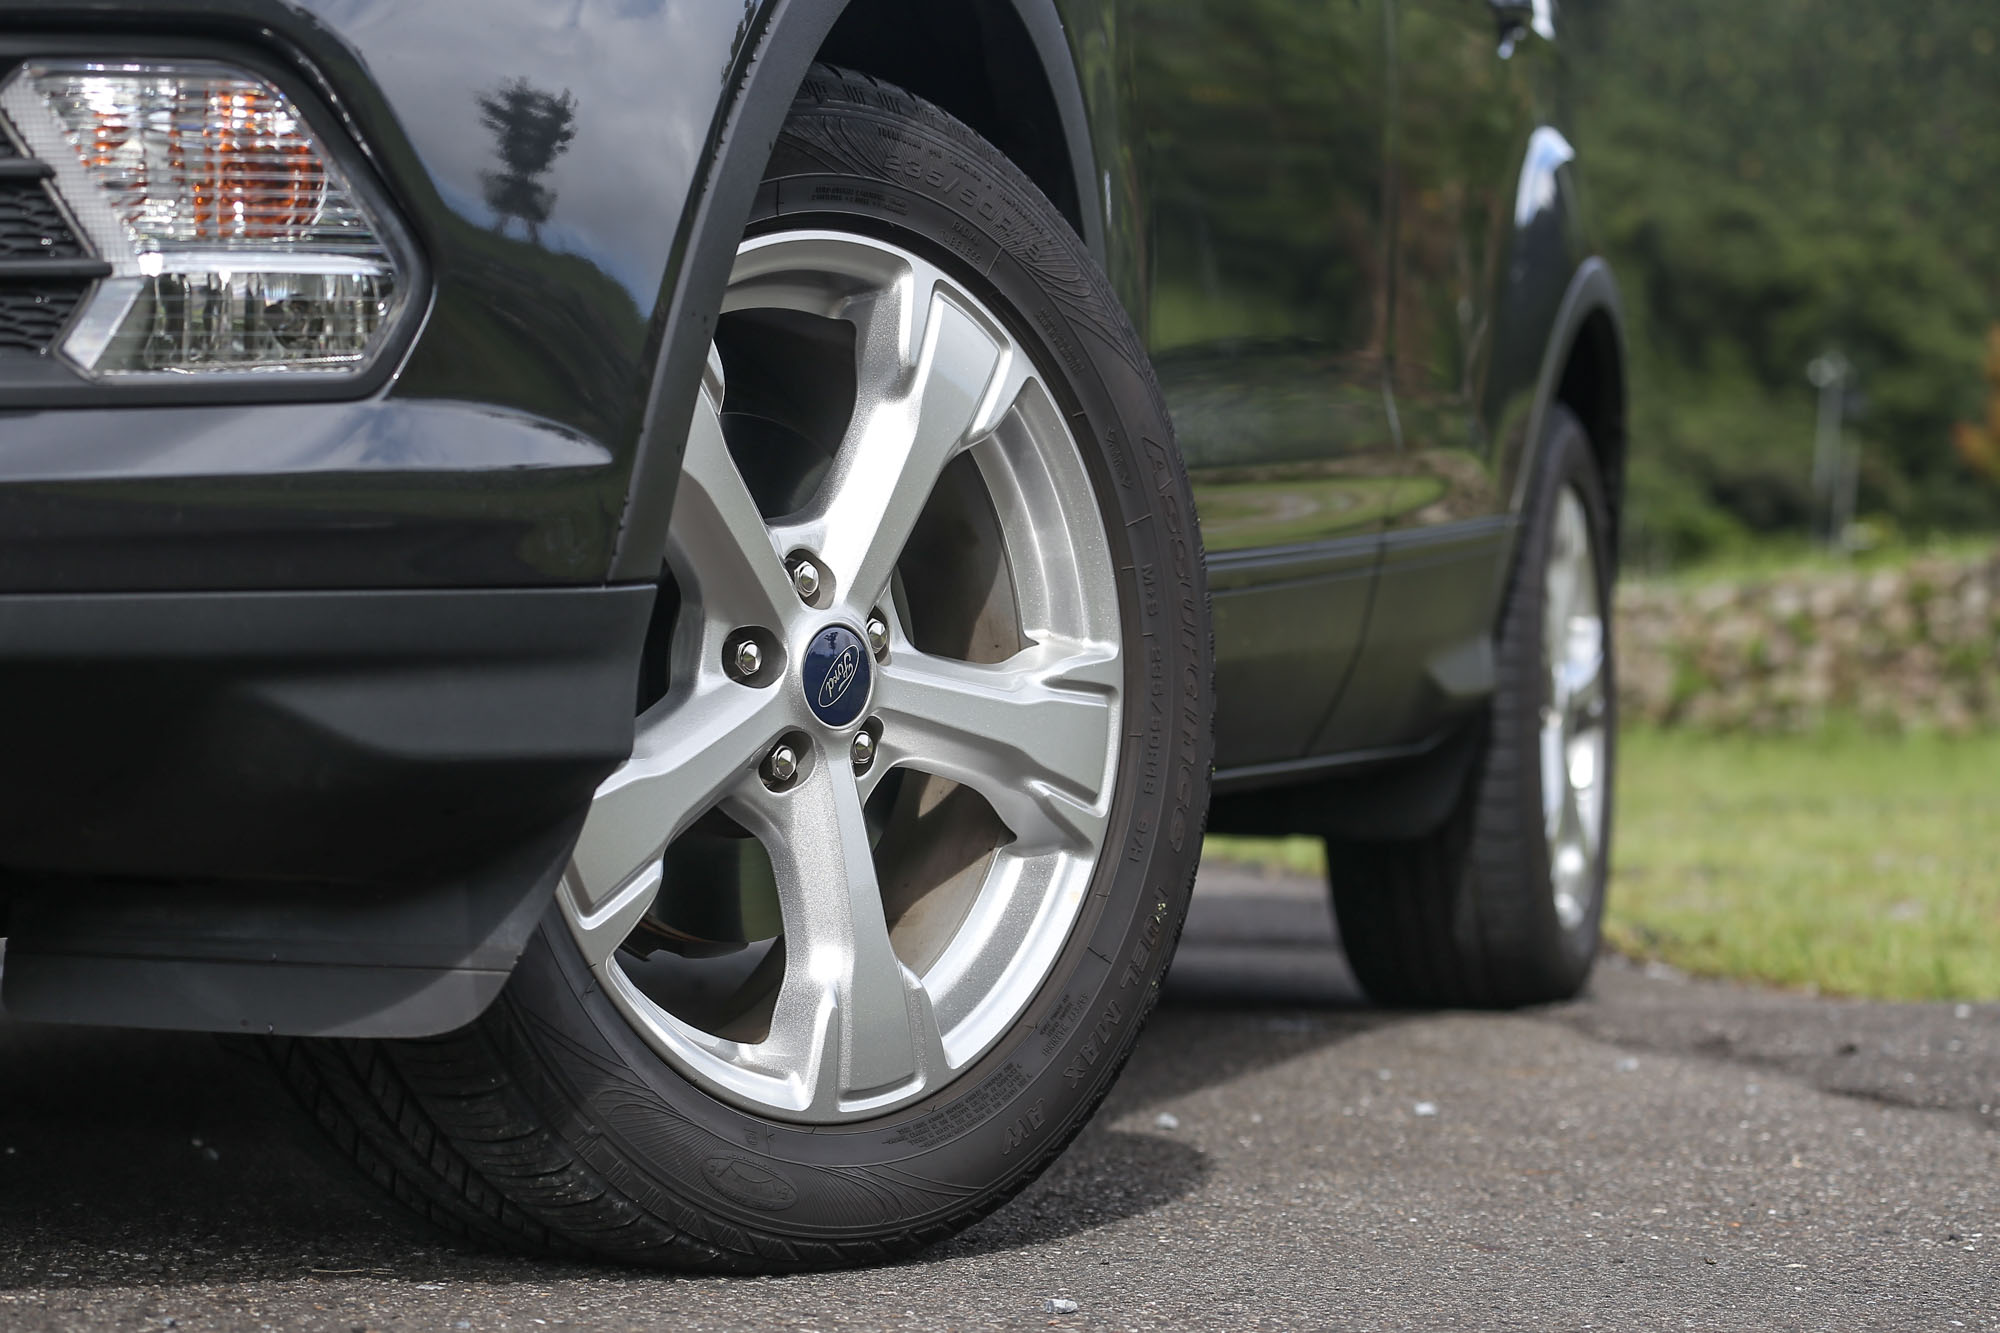 Kuga EcoBoost182 CP360 車型以上皆配備 18 吋胎圈規格。